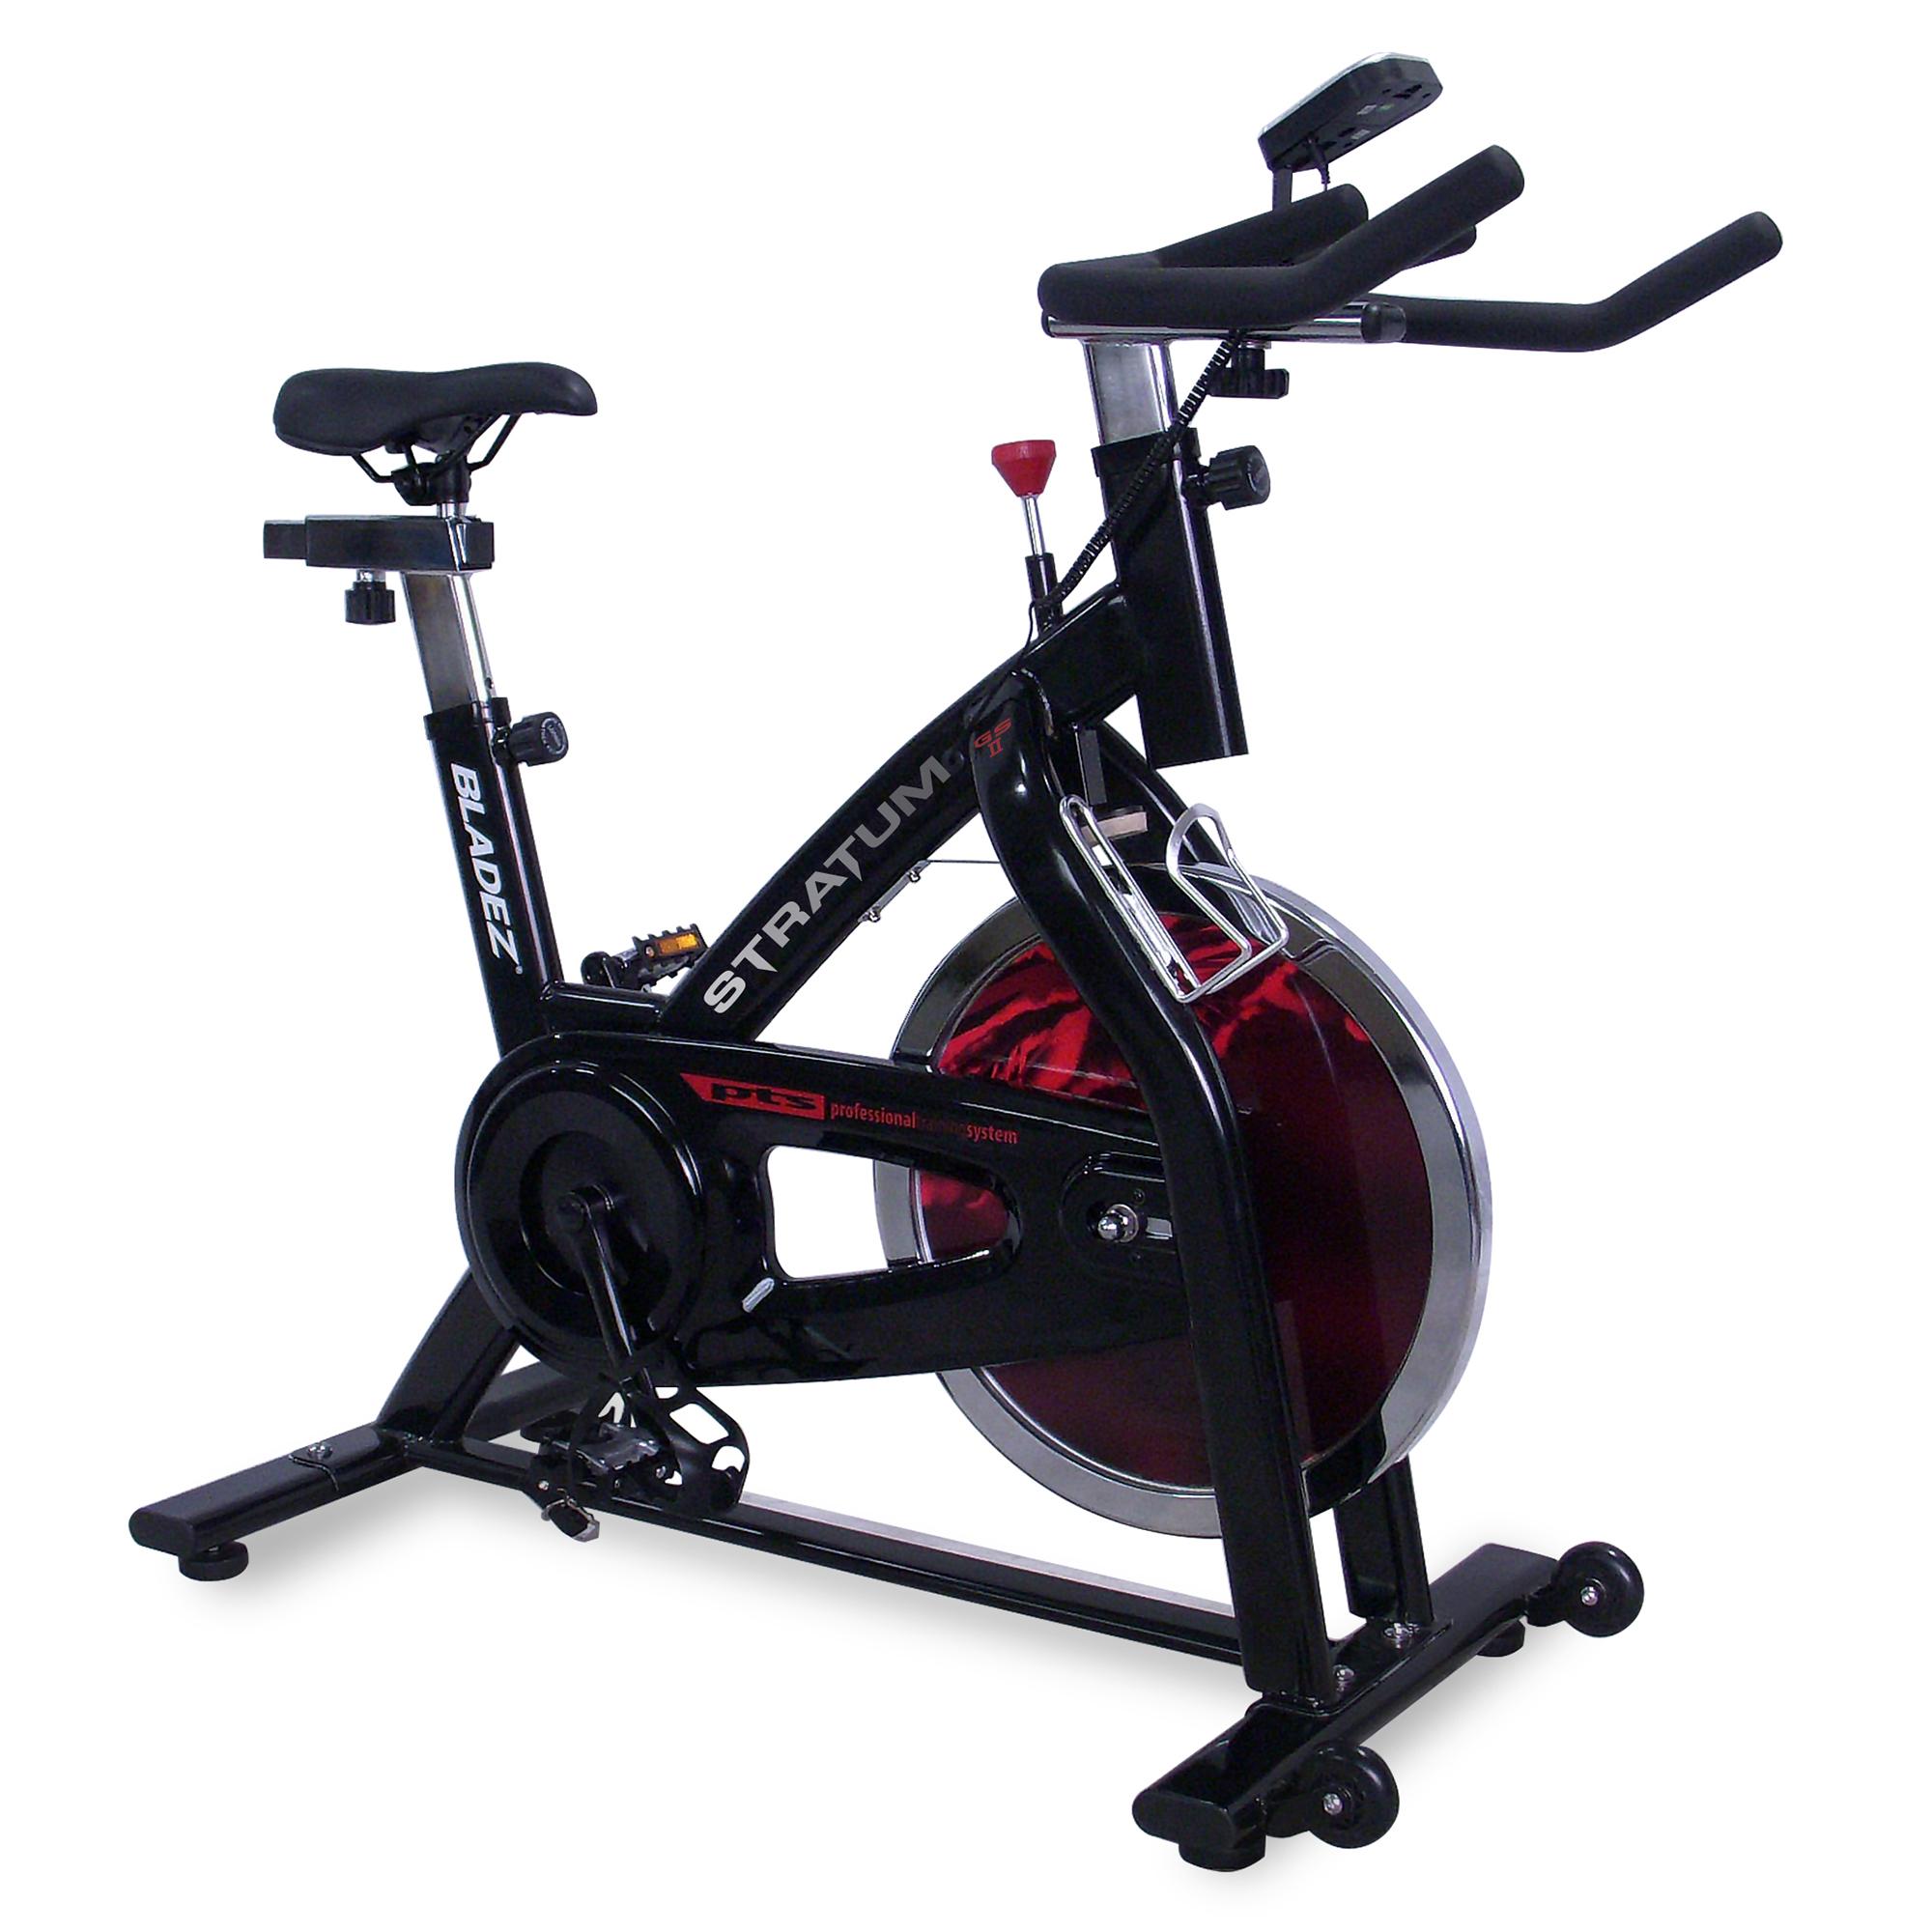 De. Pommeyeux Exercise Bike